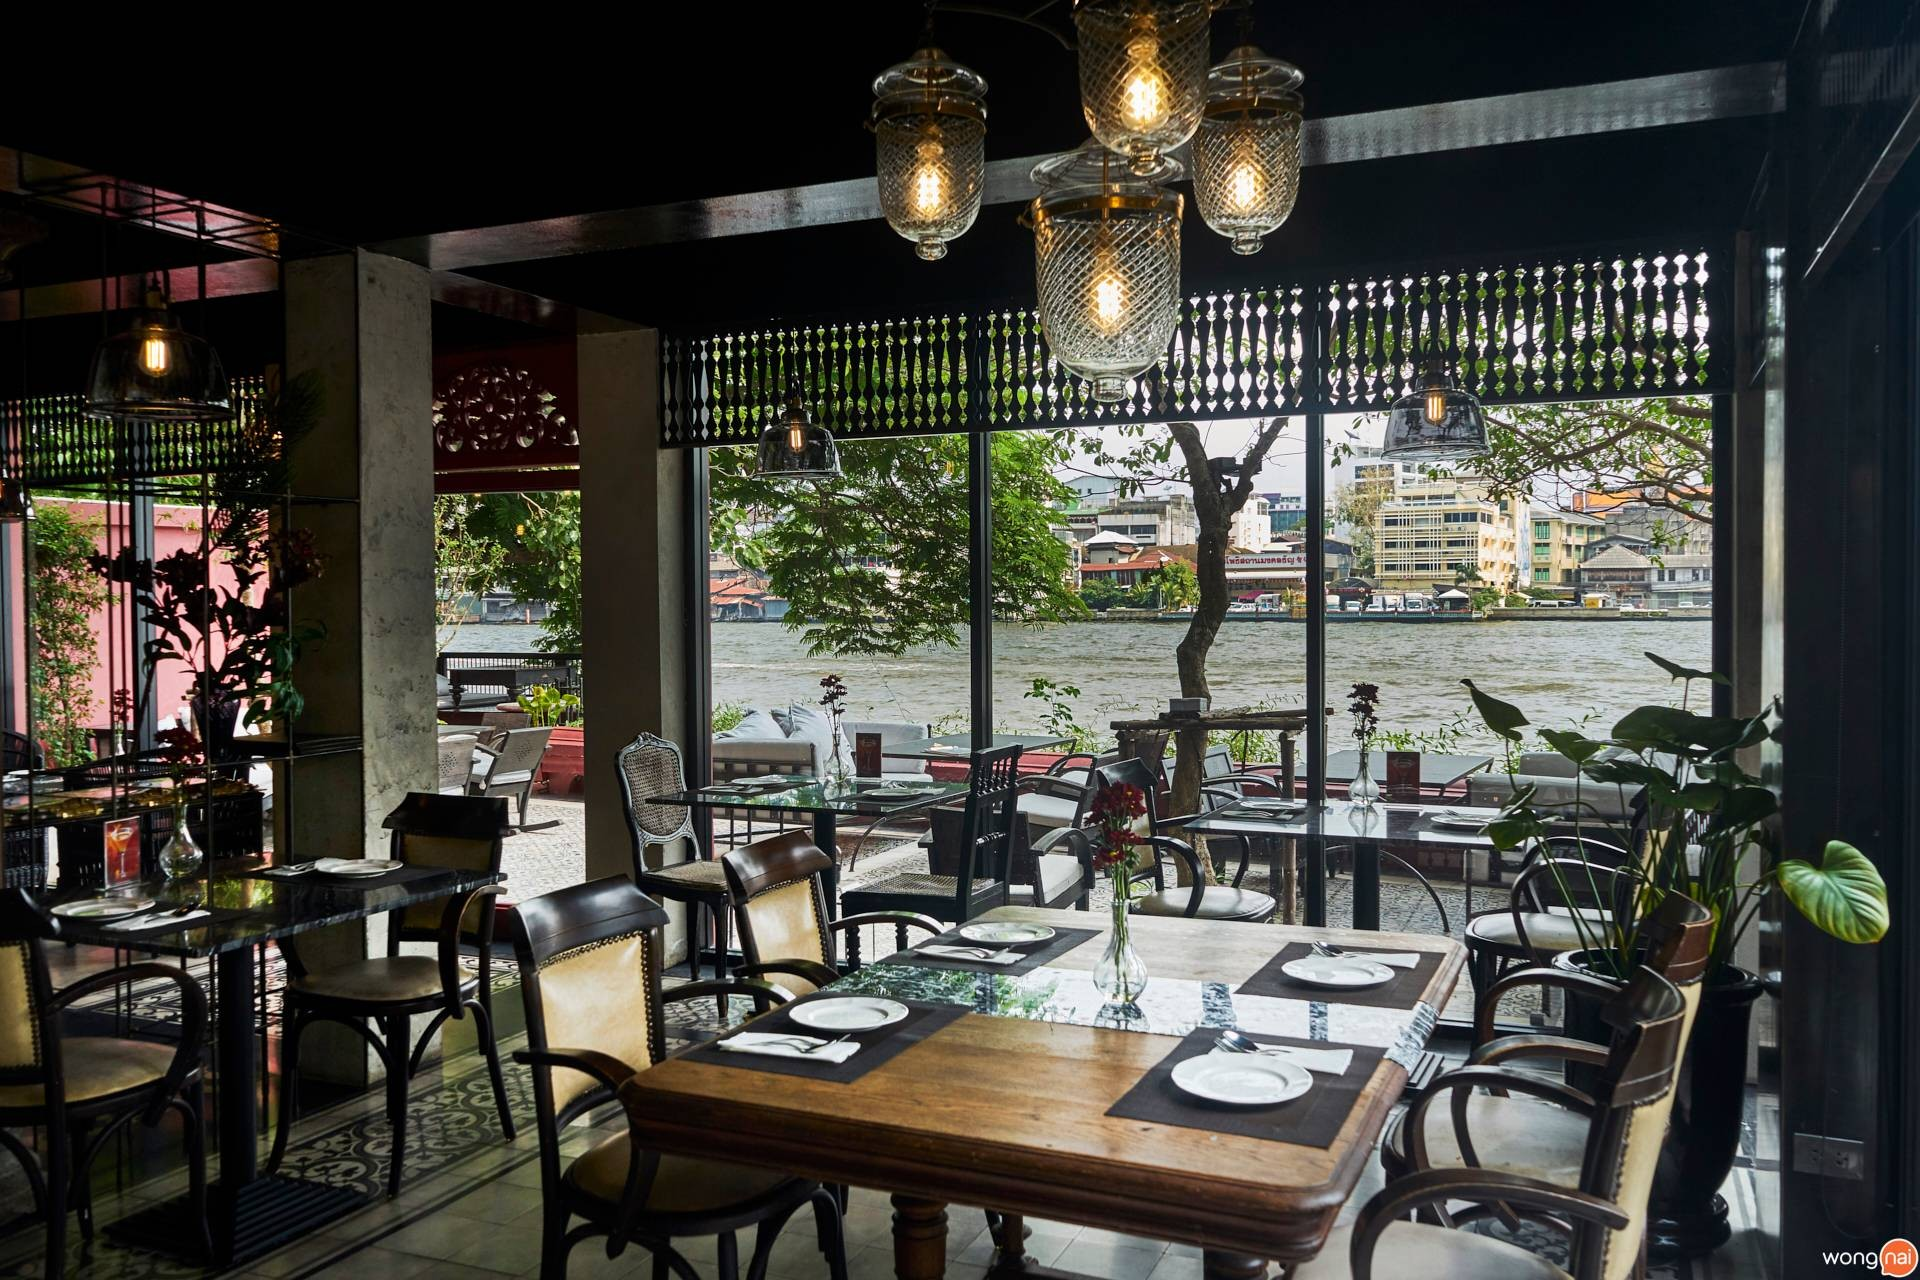 NYE Caféstaurant โรงแรมอัมแดง